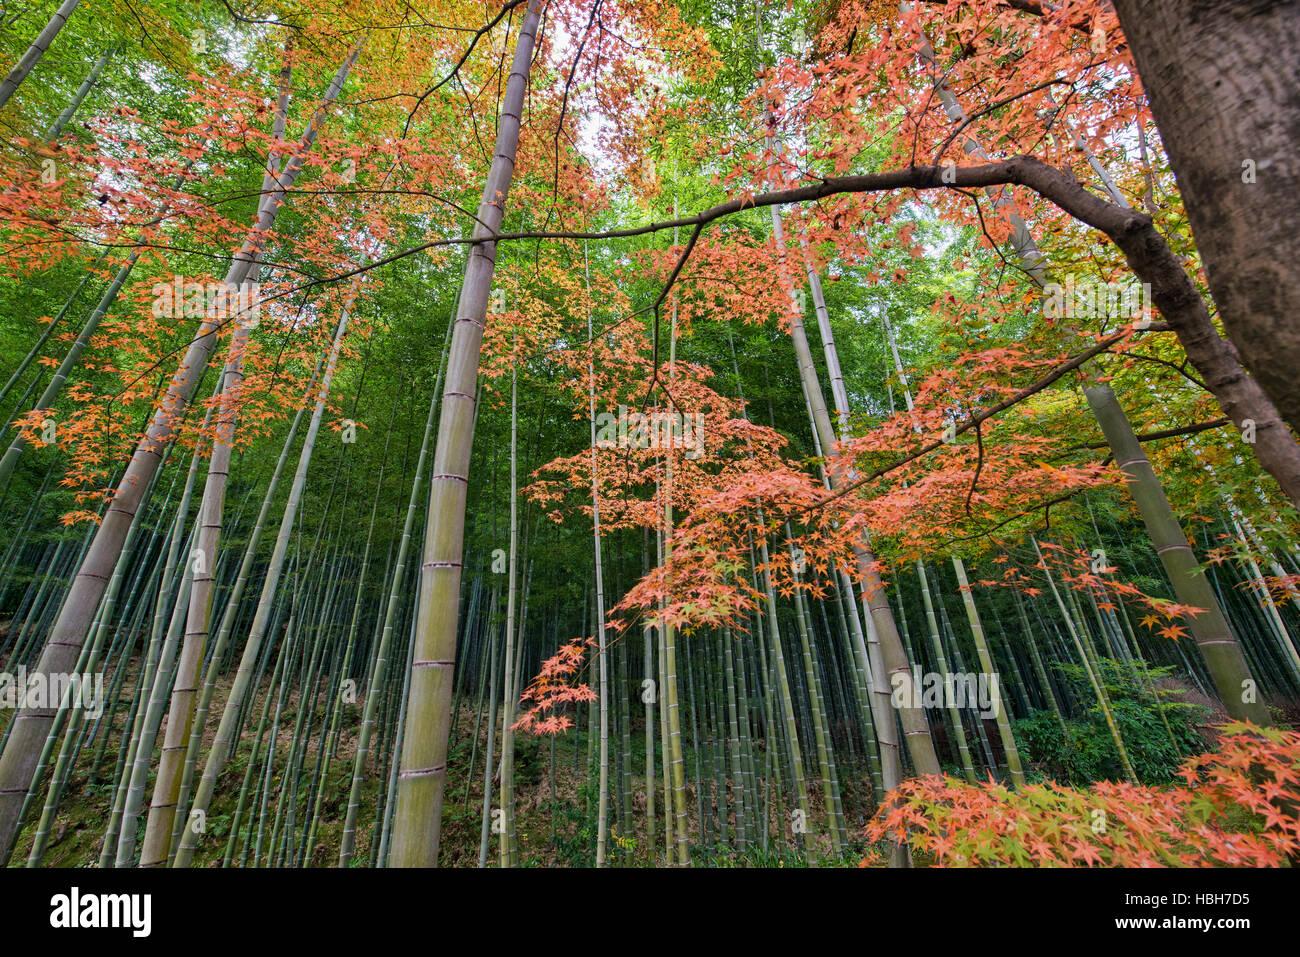 Herbstlaub Und Bambuswald Arashiyama Kyoto Japan Stockfoto Bild